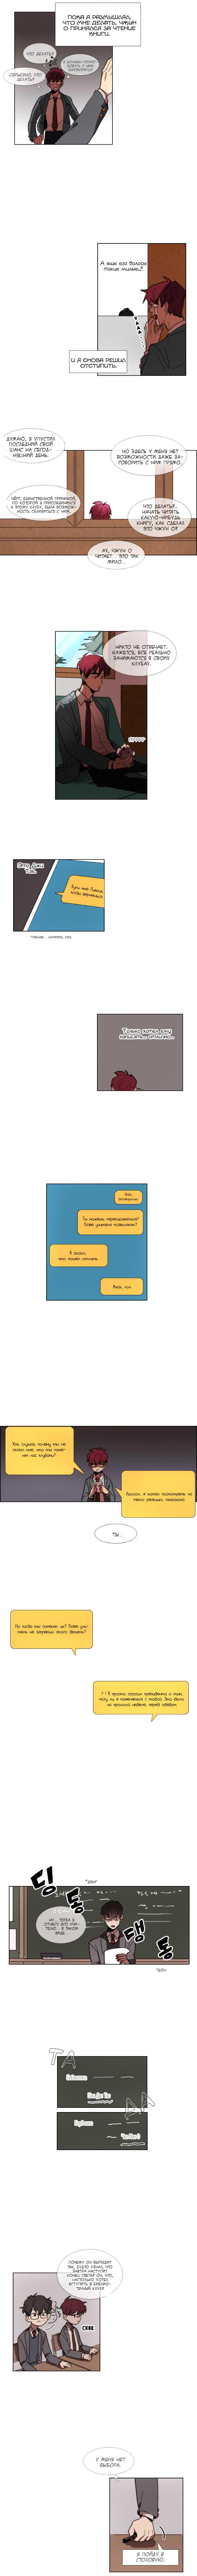 https://r1.ninemanga.com/comics/pic2/27/31131/409987/1519639505896.jpg Page 2